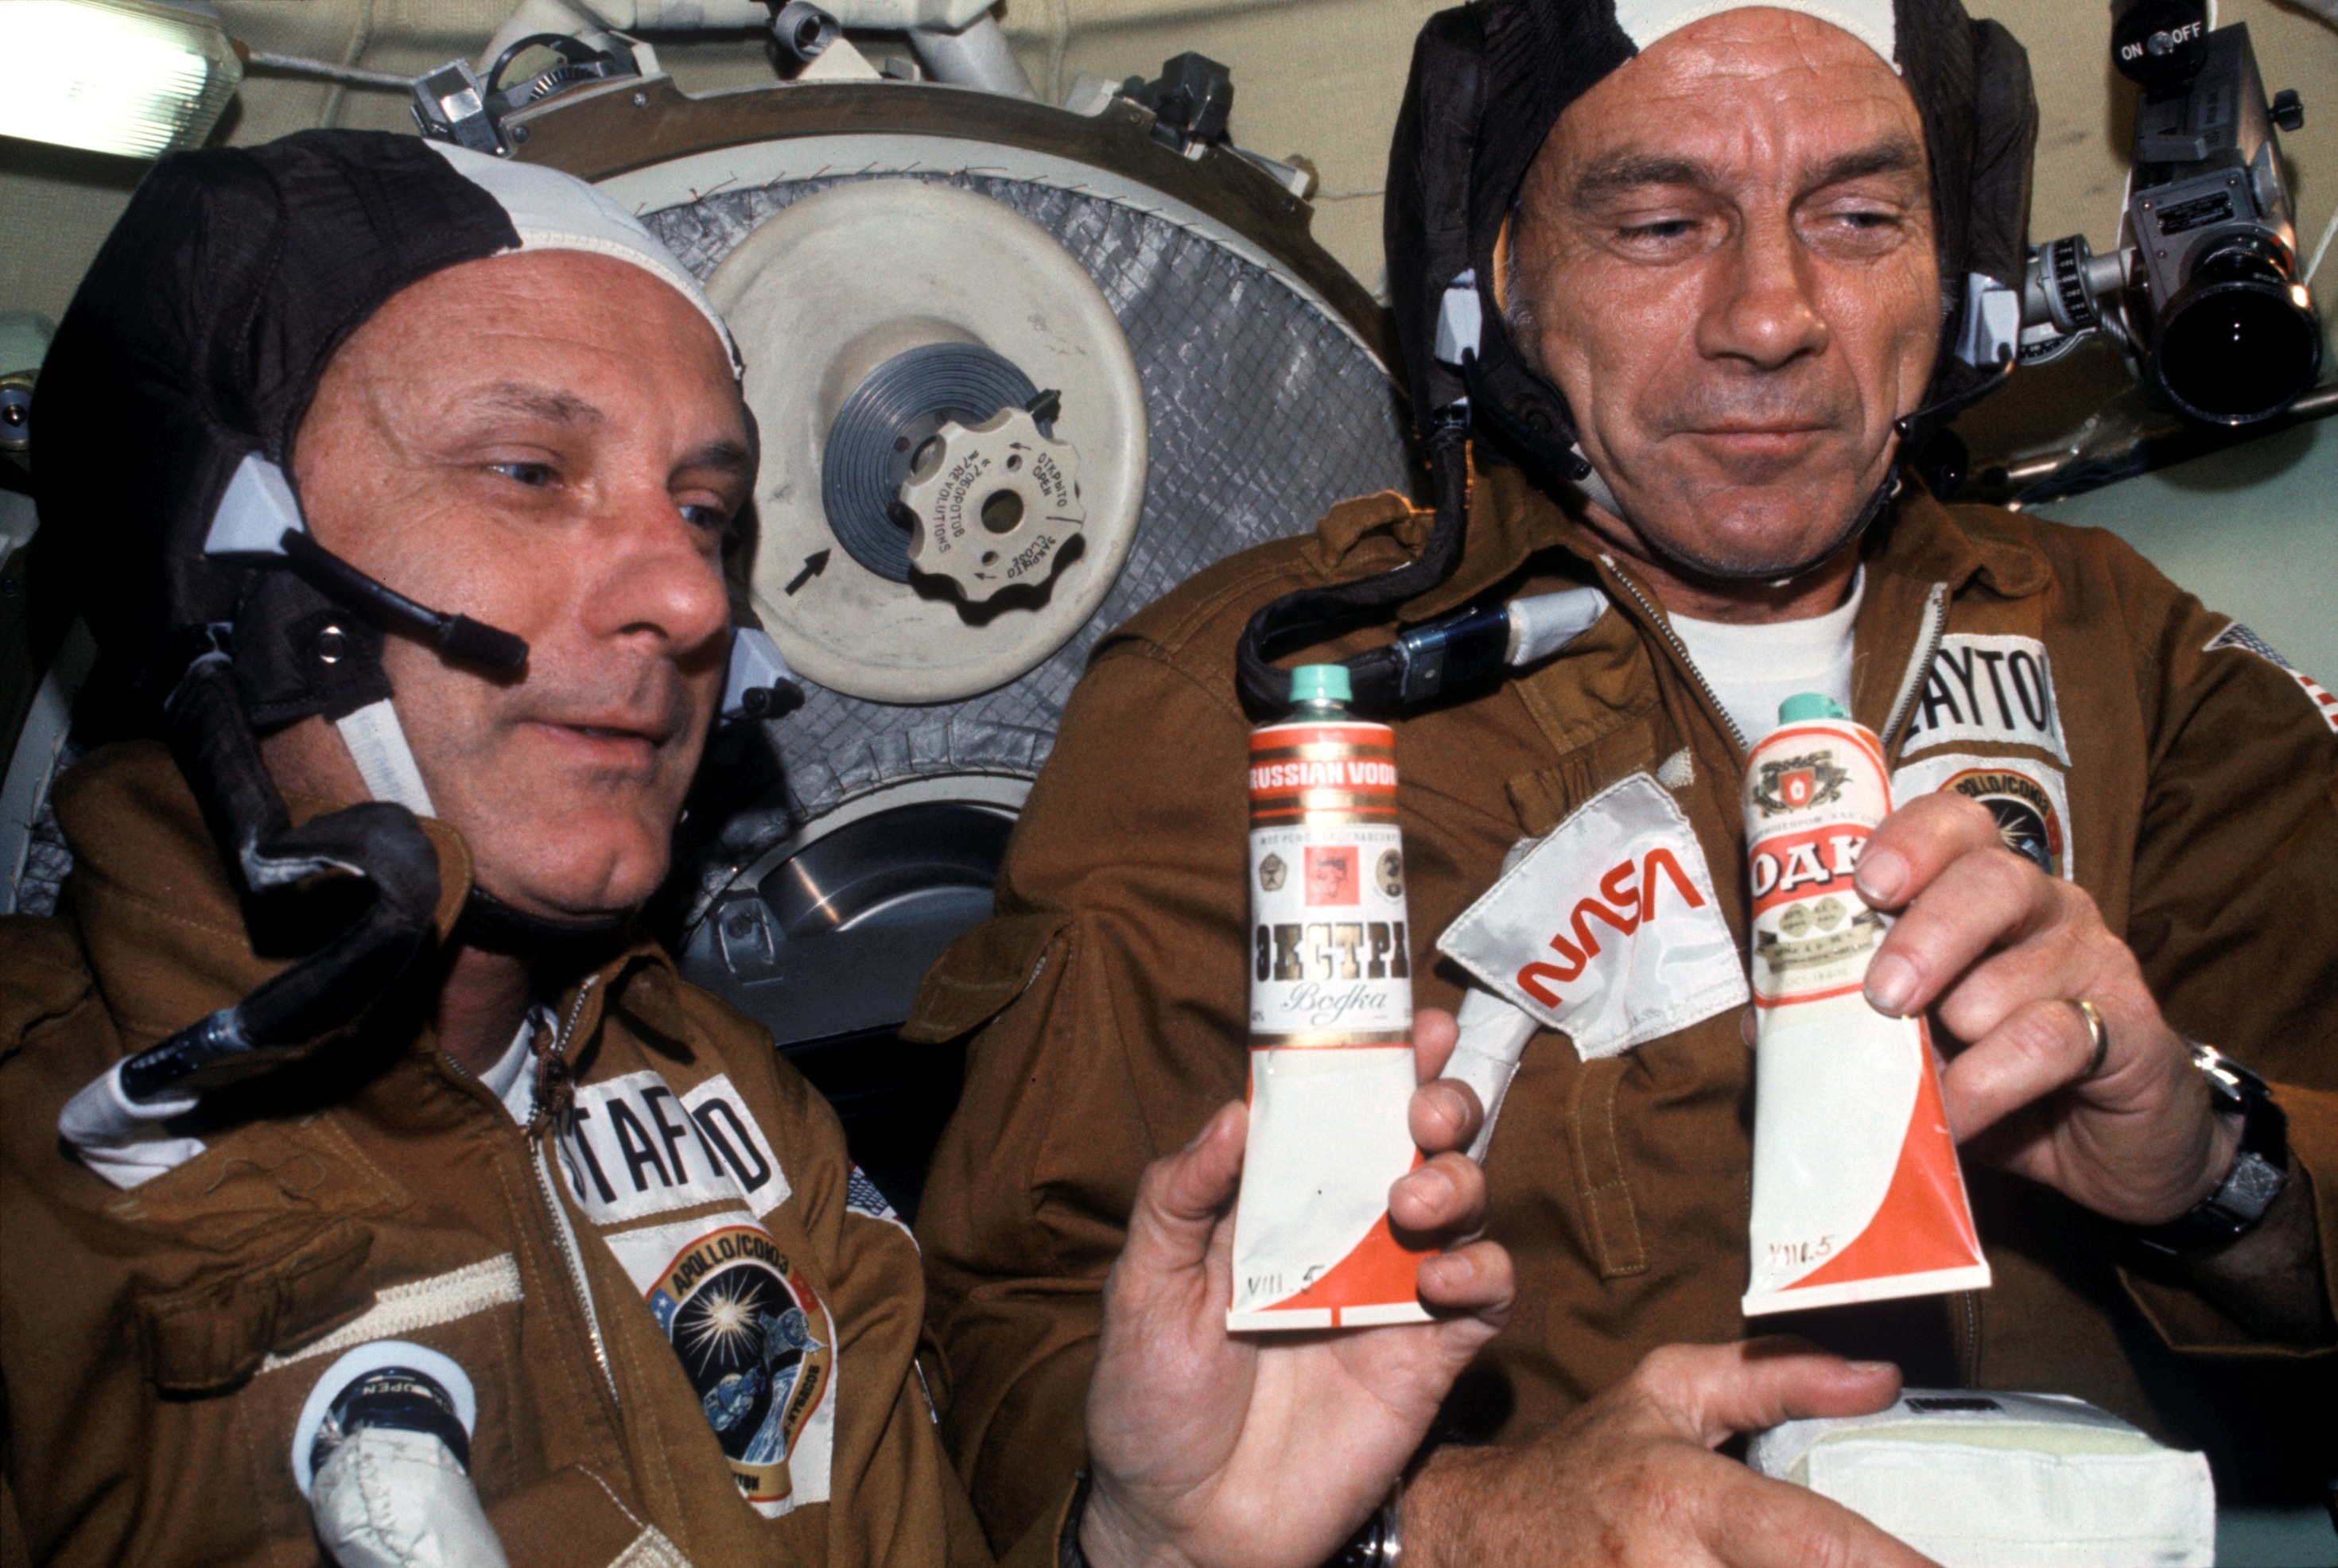 Фото: С Днем космонавтики! Томас Стаффорд и Дональд Слейтон, «Союз-Апполон», 1975